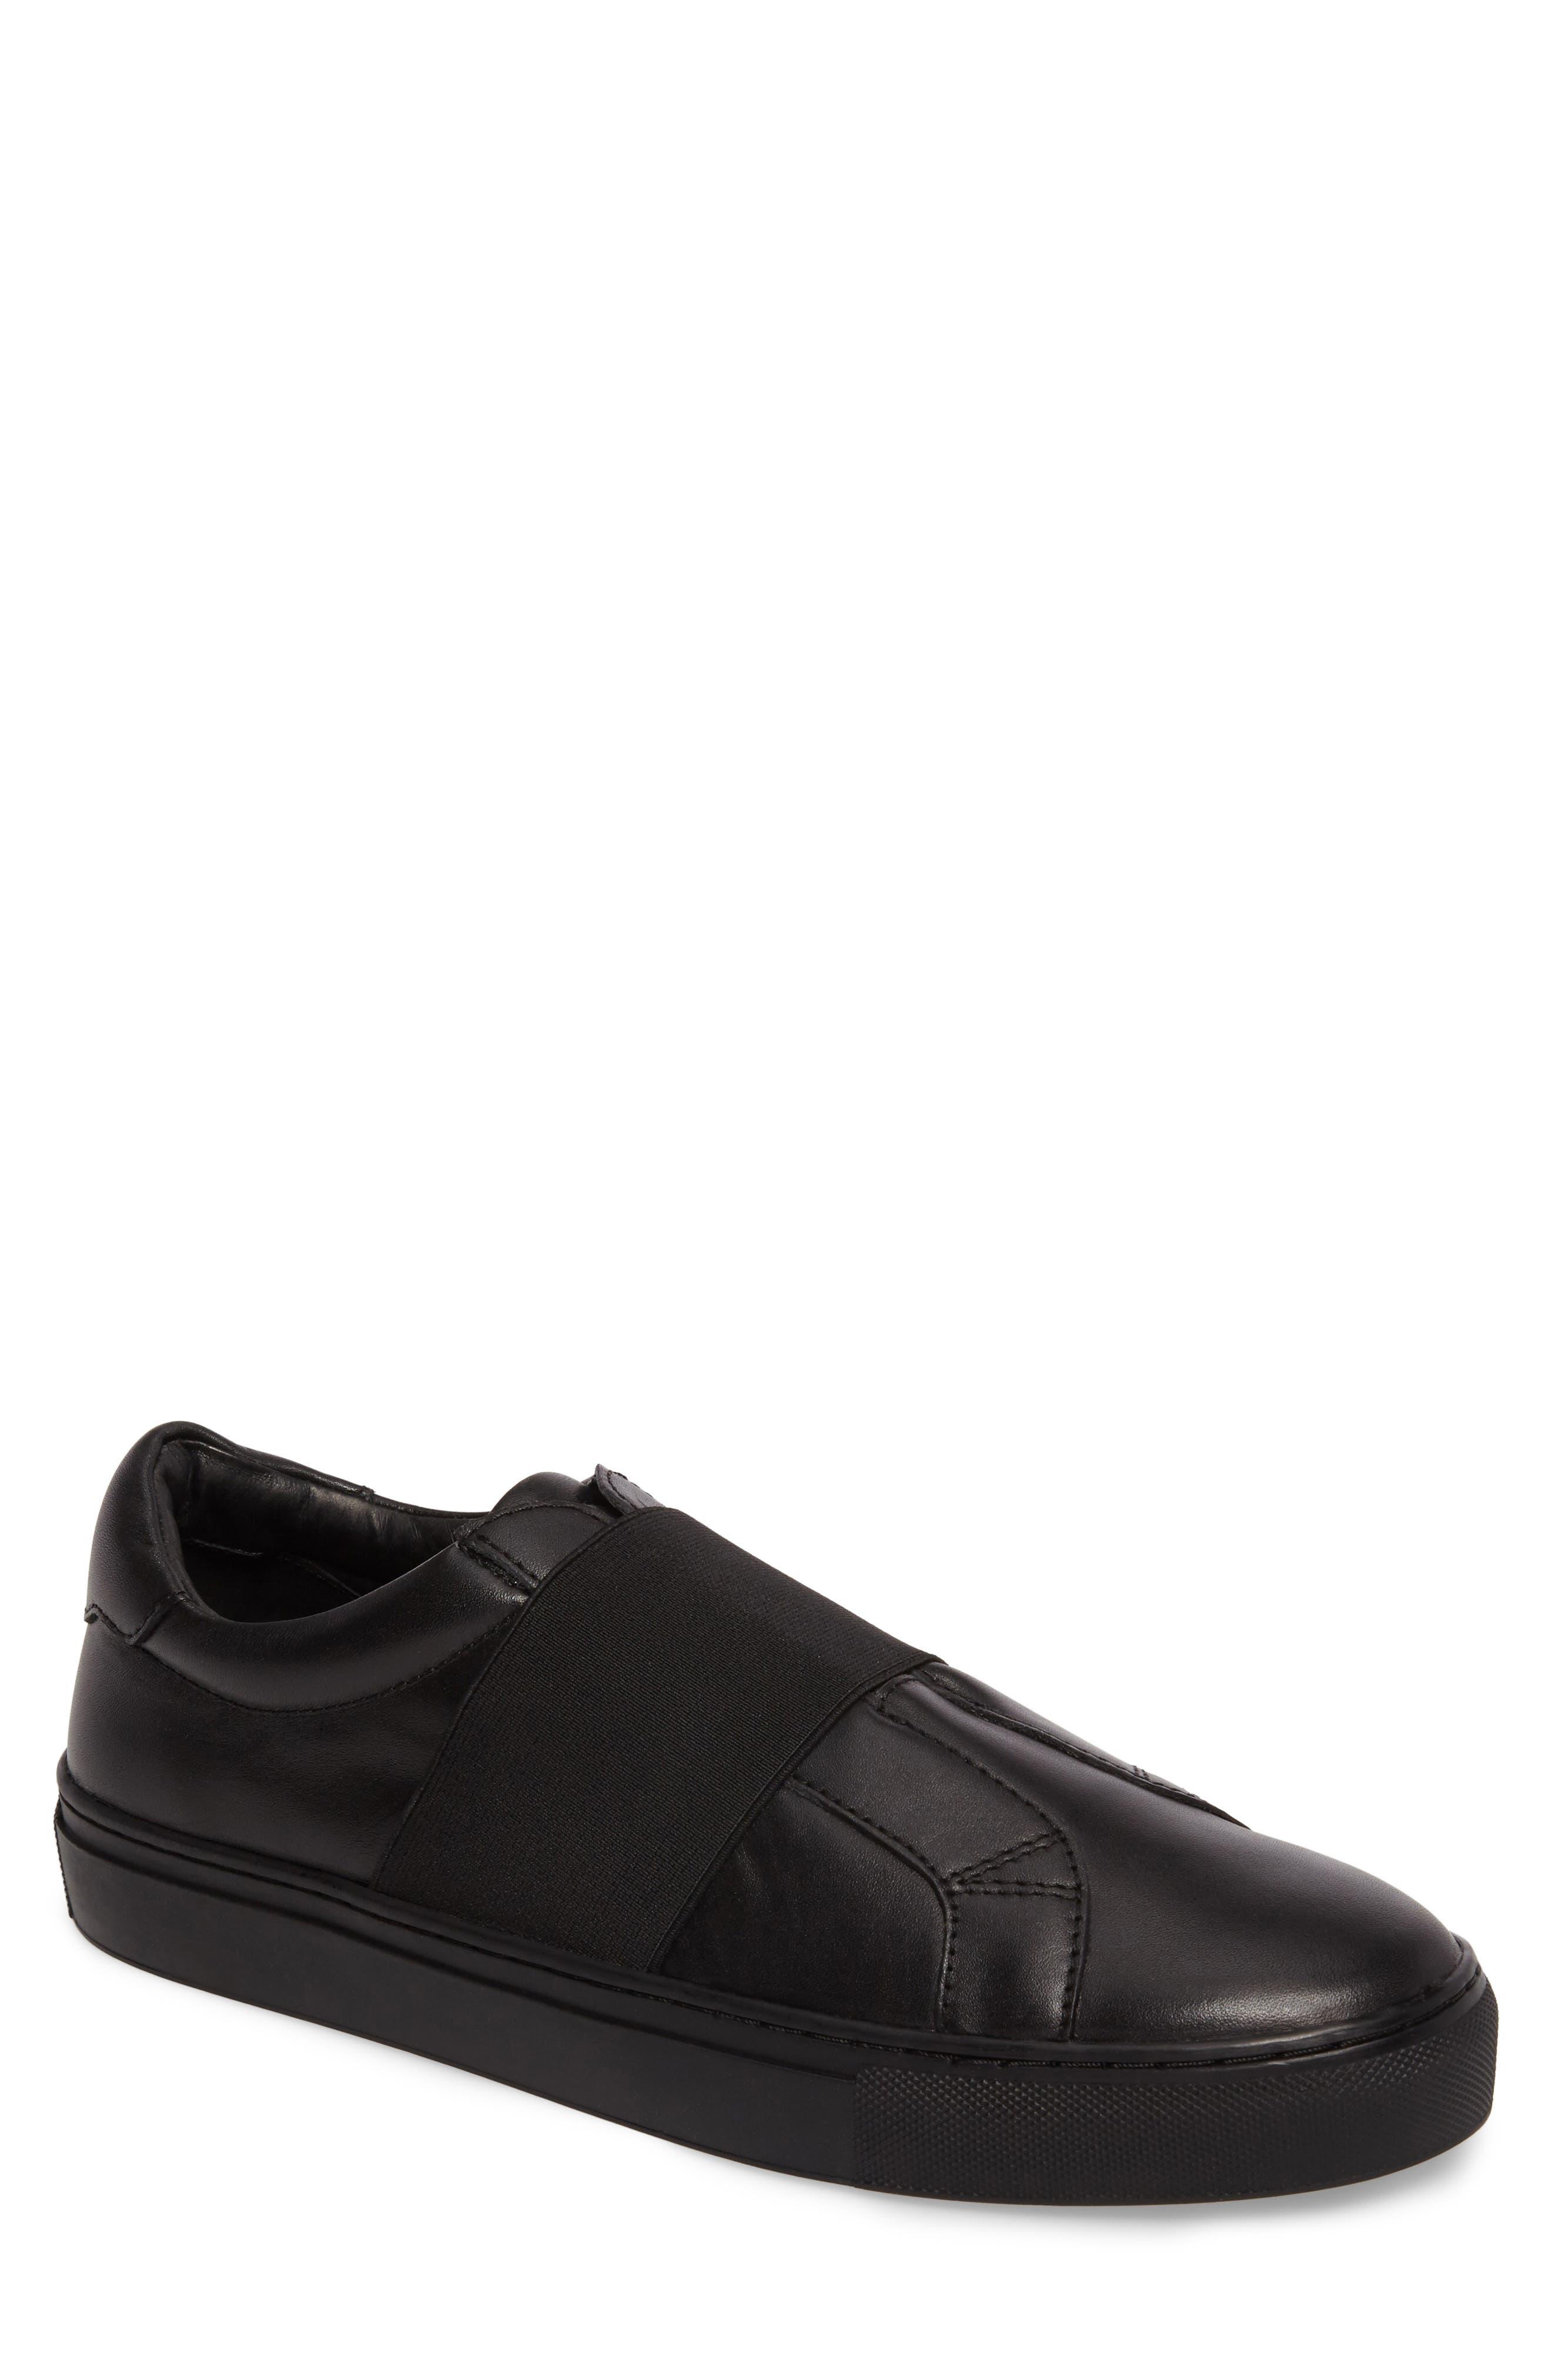 Darel Slip-On,                             Main thumbnail 1, color,                             Black Leather